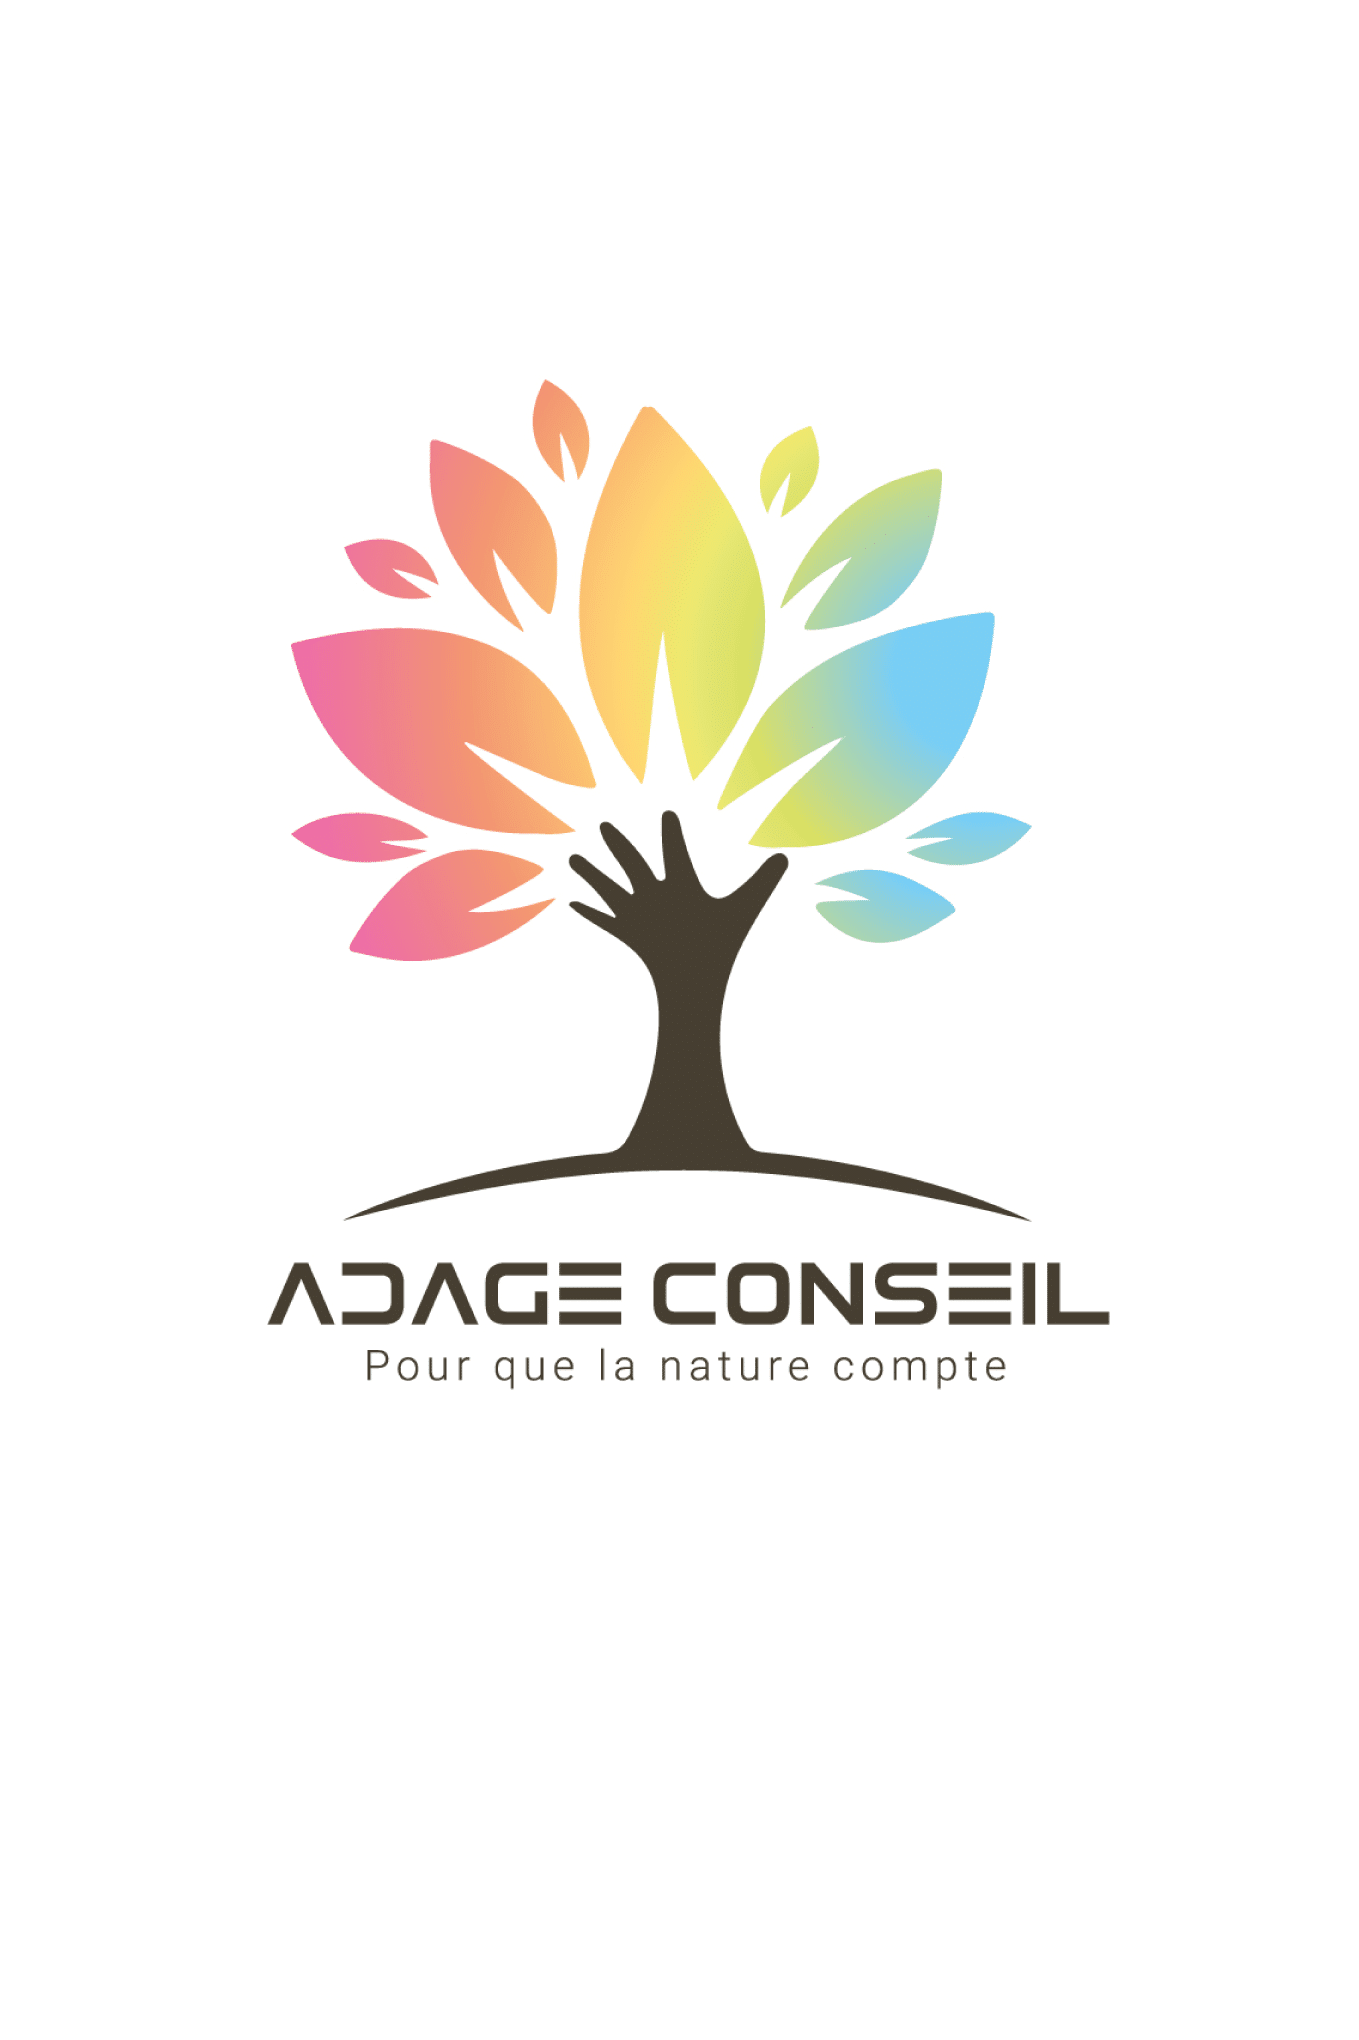 Domolandes Entreprise : Adage Conseil